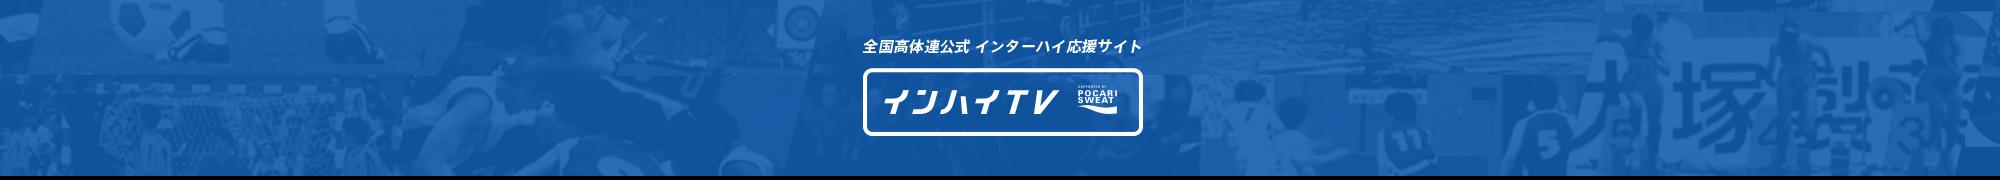 大会名 : 令和2年度 埼玉県高等学校体育大会 フェンシング競技大会開催日 : 2020年8月17日(月)場 所 : 深谷ビッグタートル結 果 : 角坂大陸 (立教新座) 10 -…